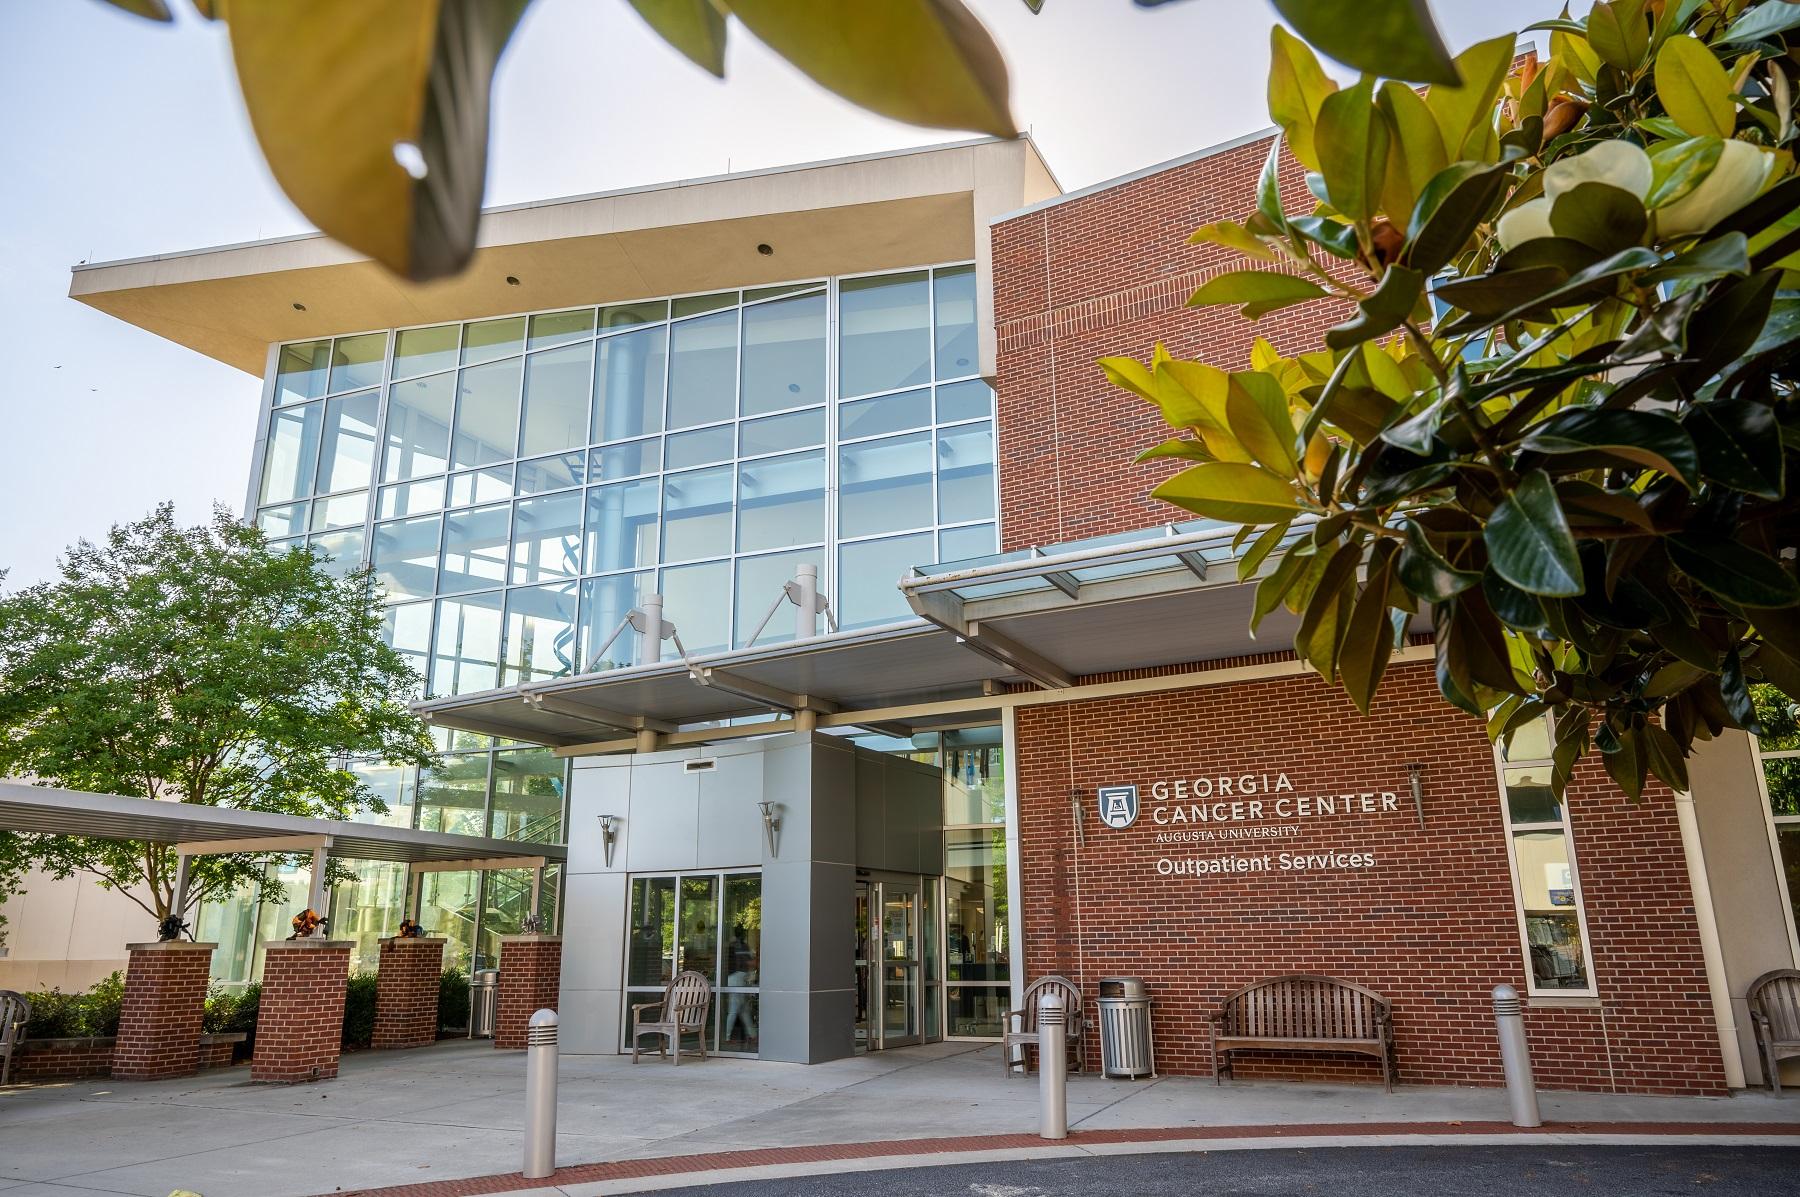 Cancer patient clinic building